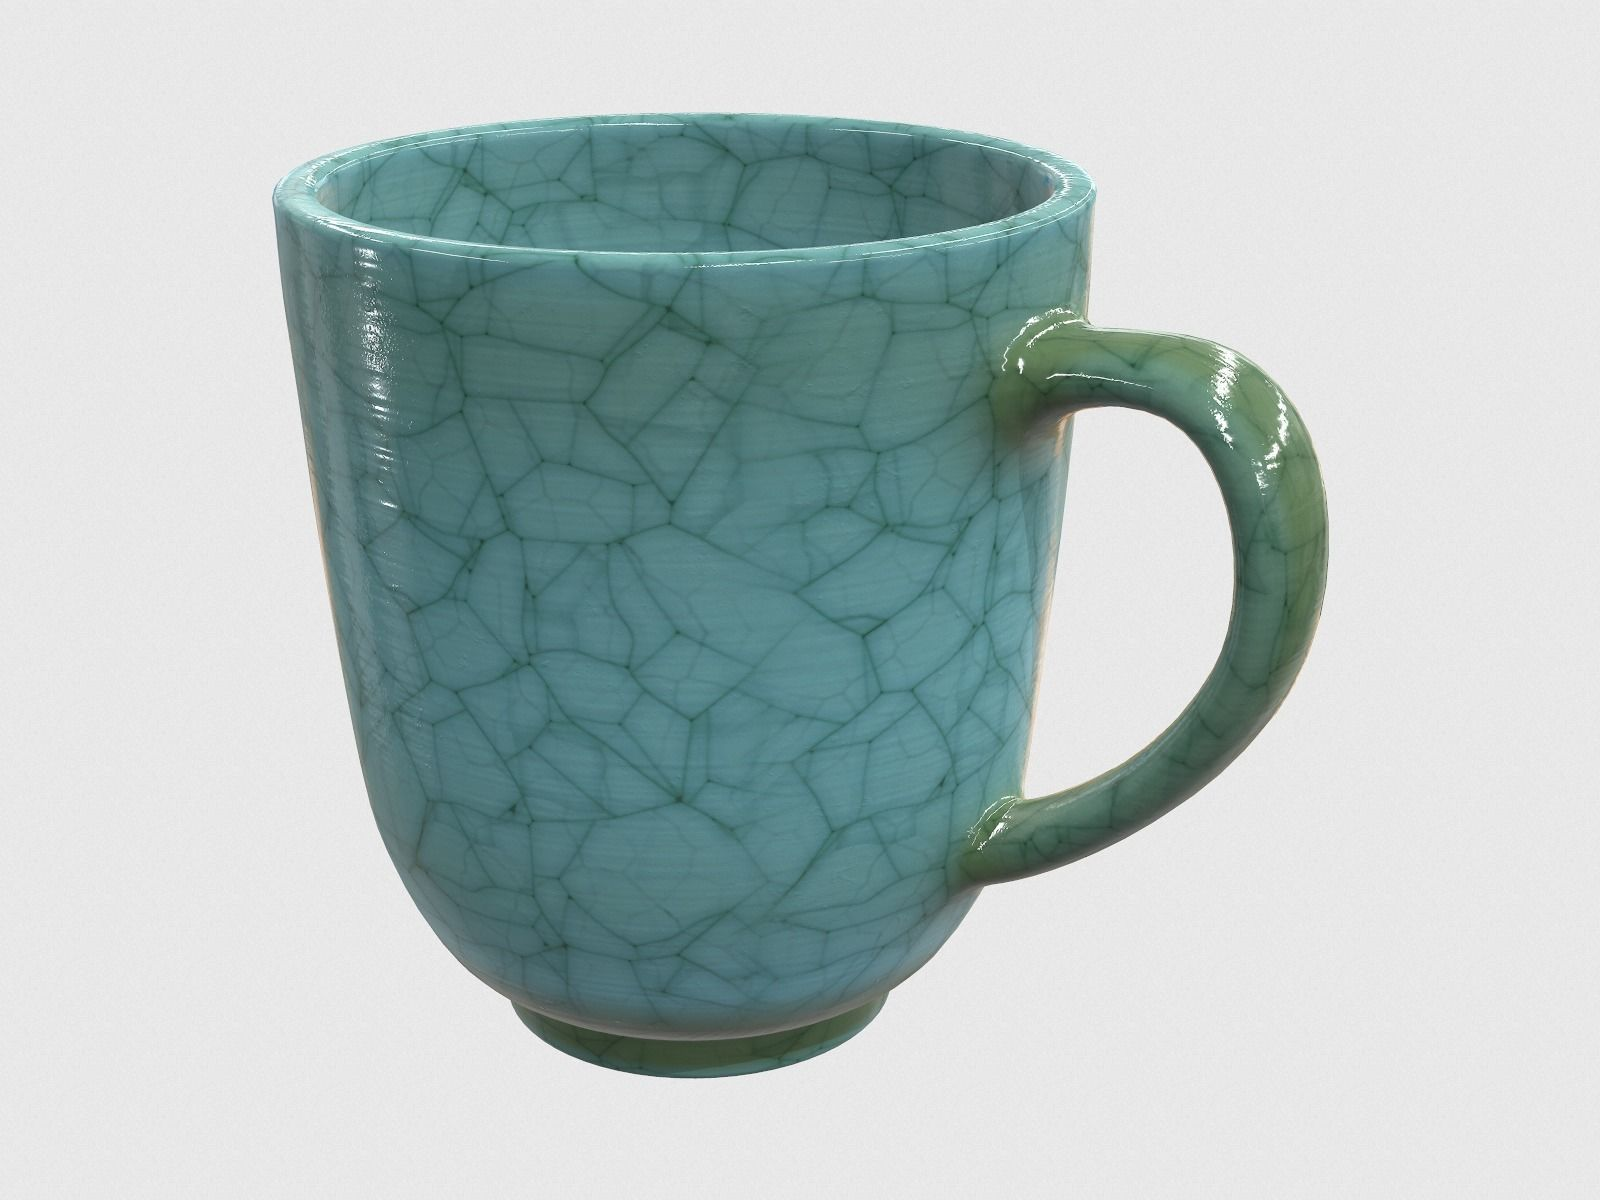 Antique Ceramic Mug